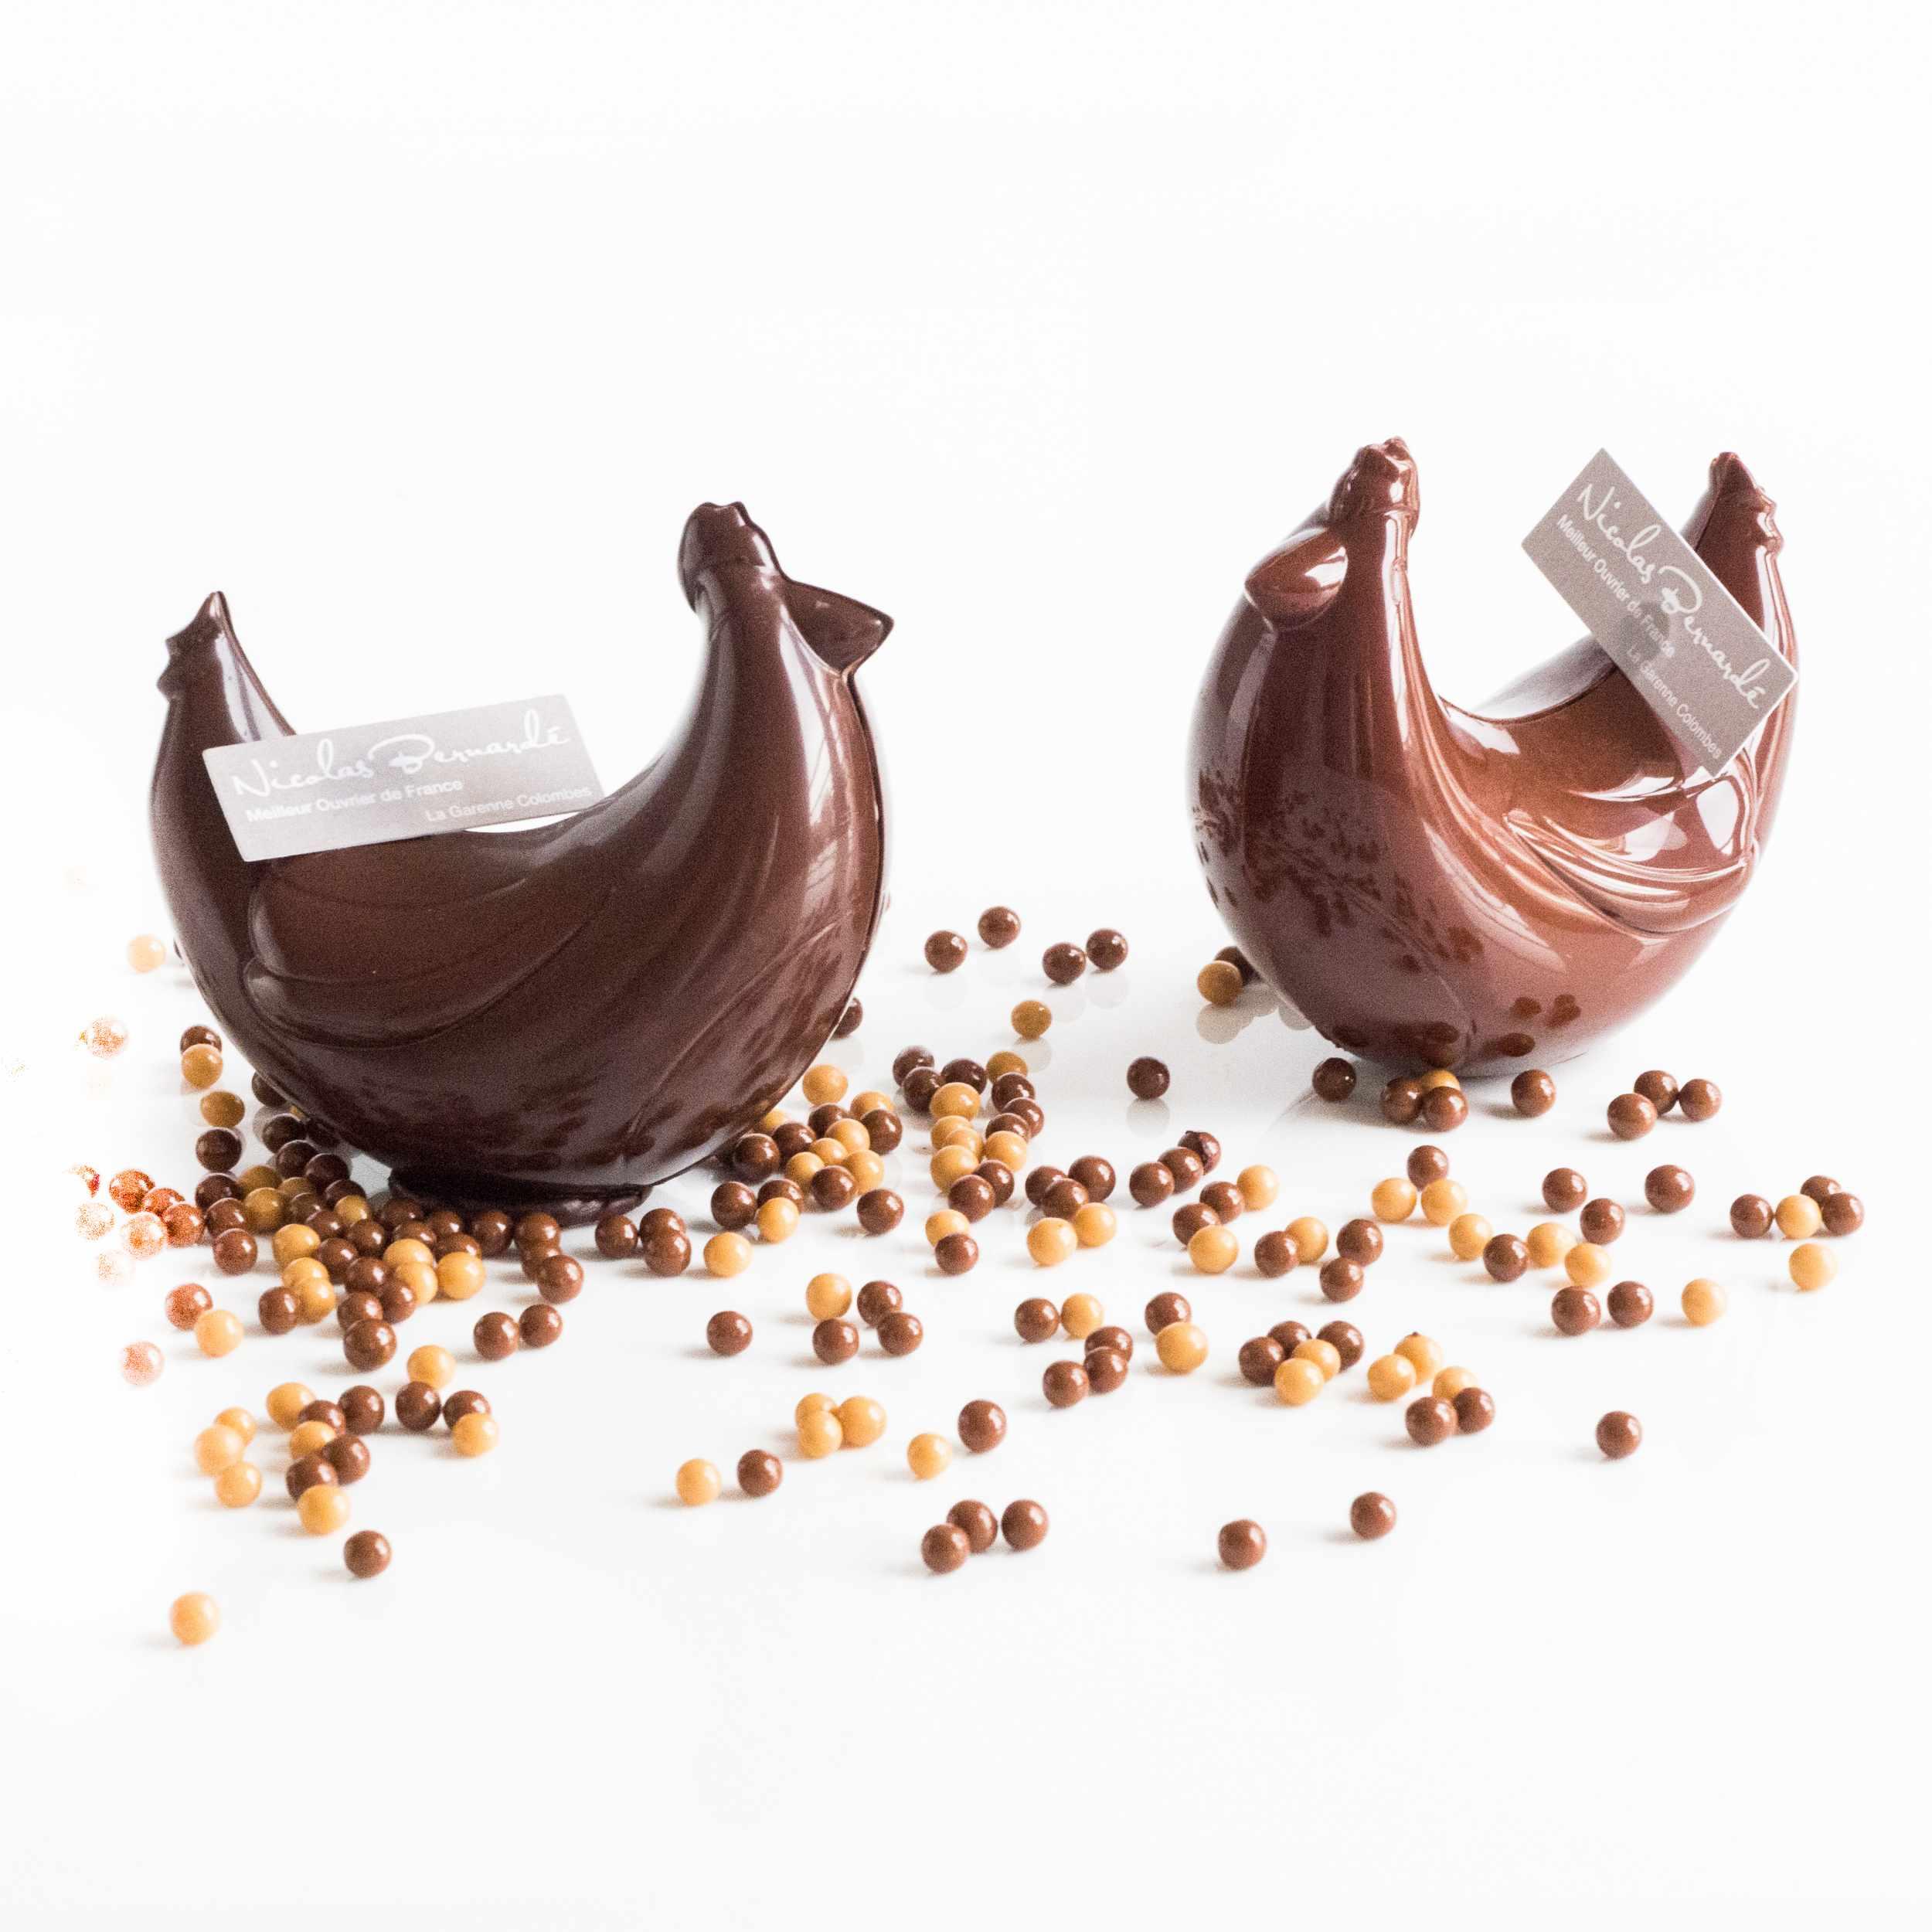 petite-cocotte-chocolat.jpg